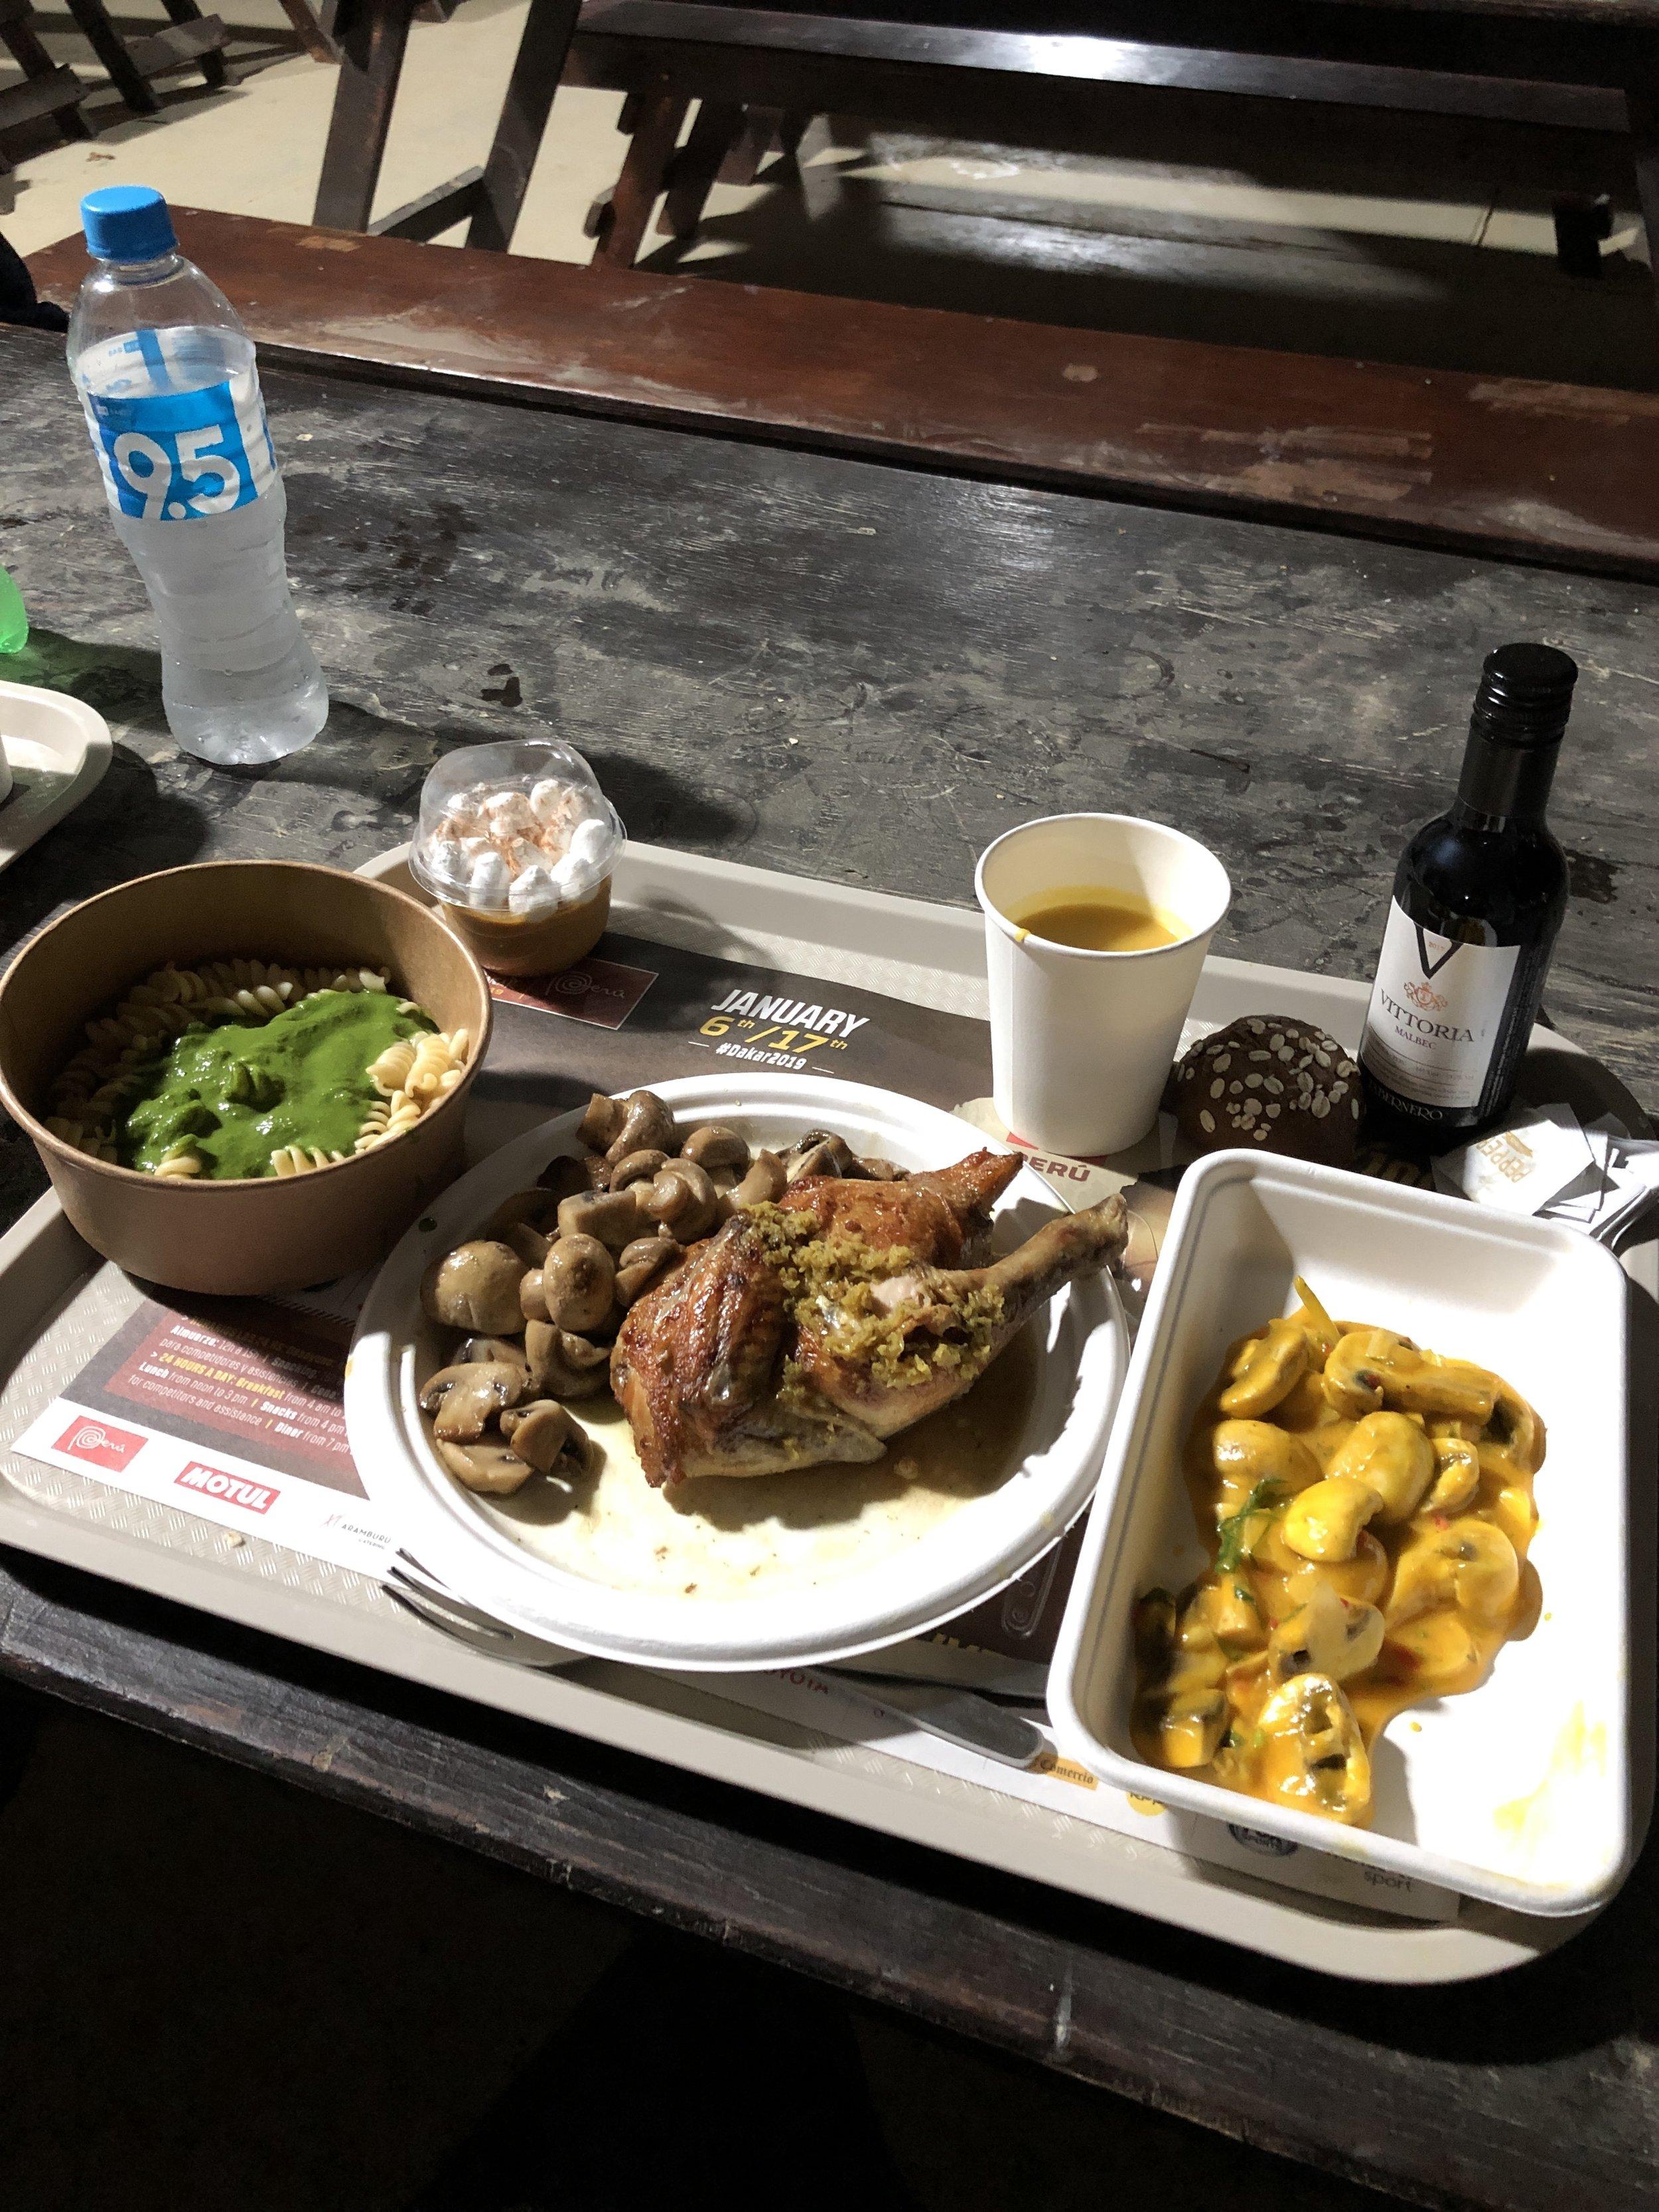 Stage 1 Bivouac Dinner